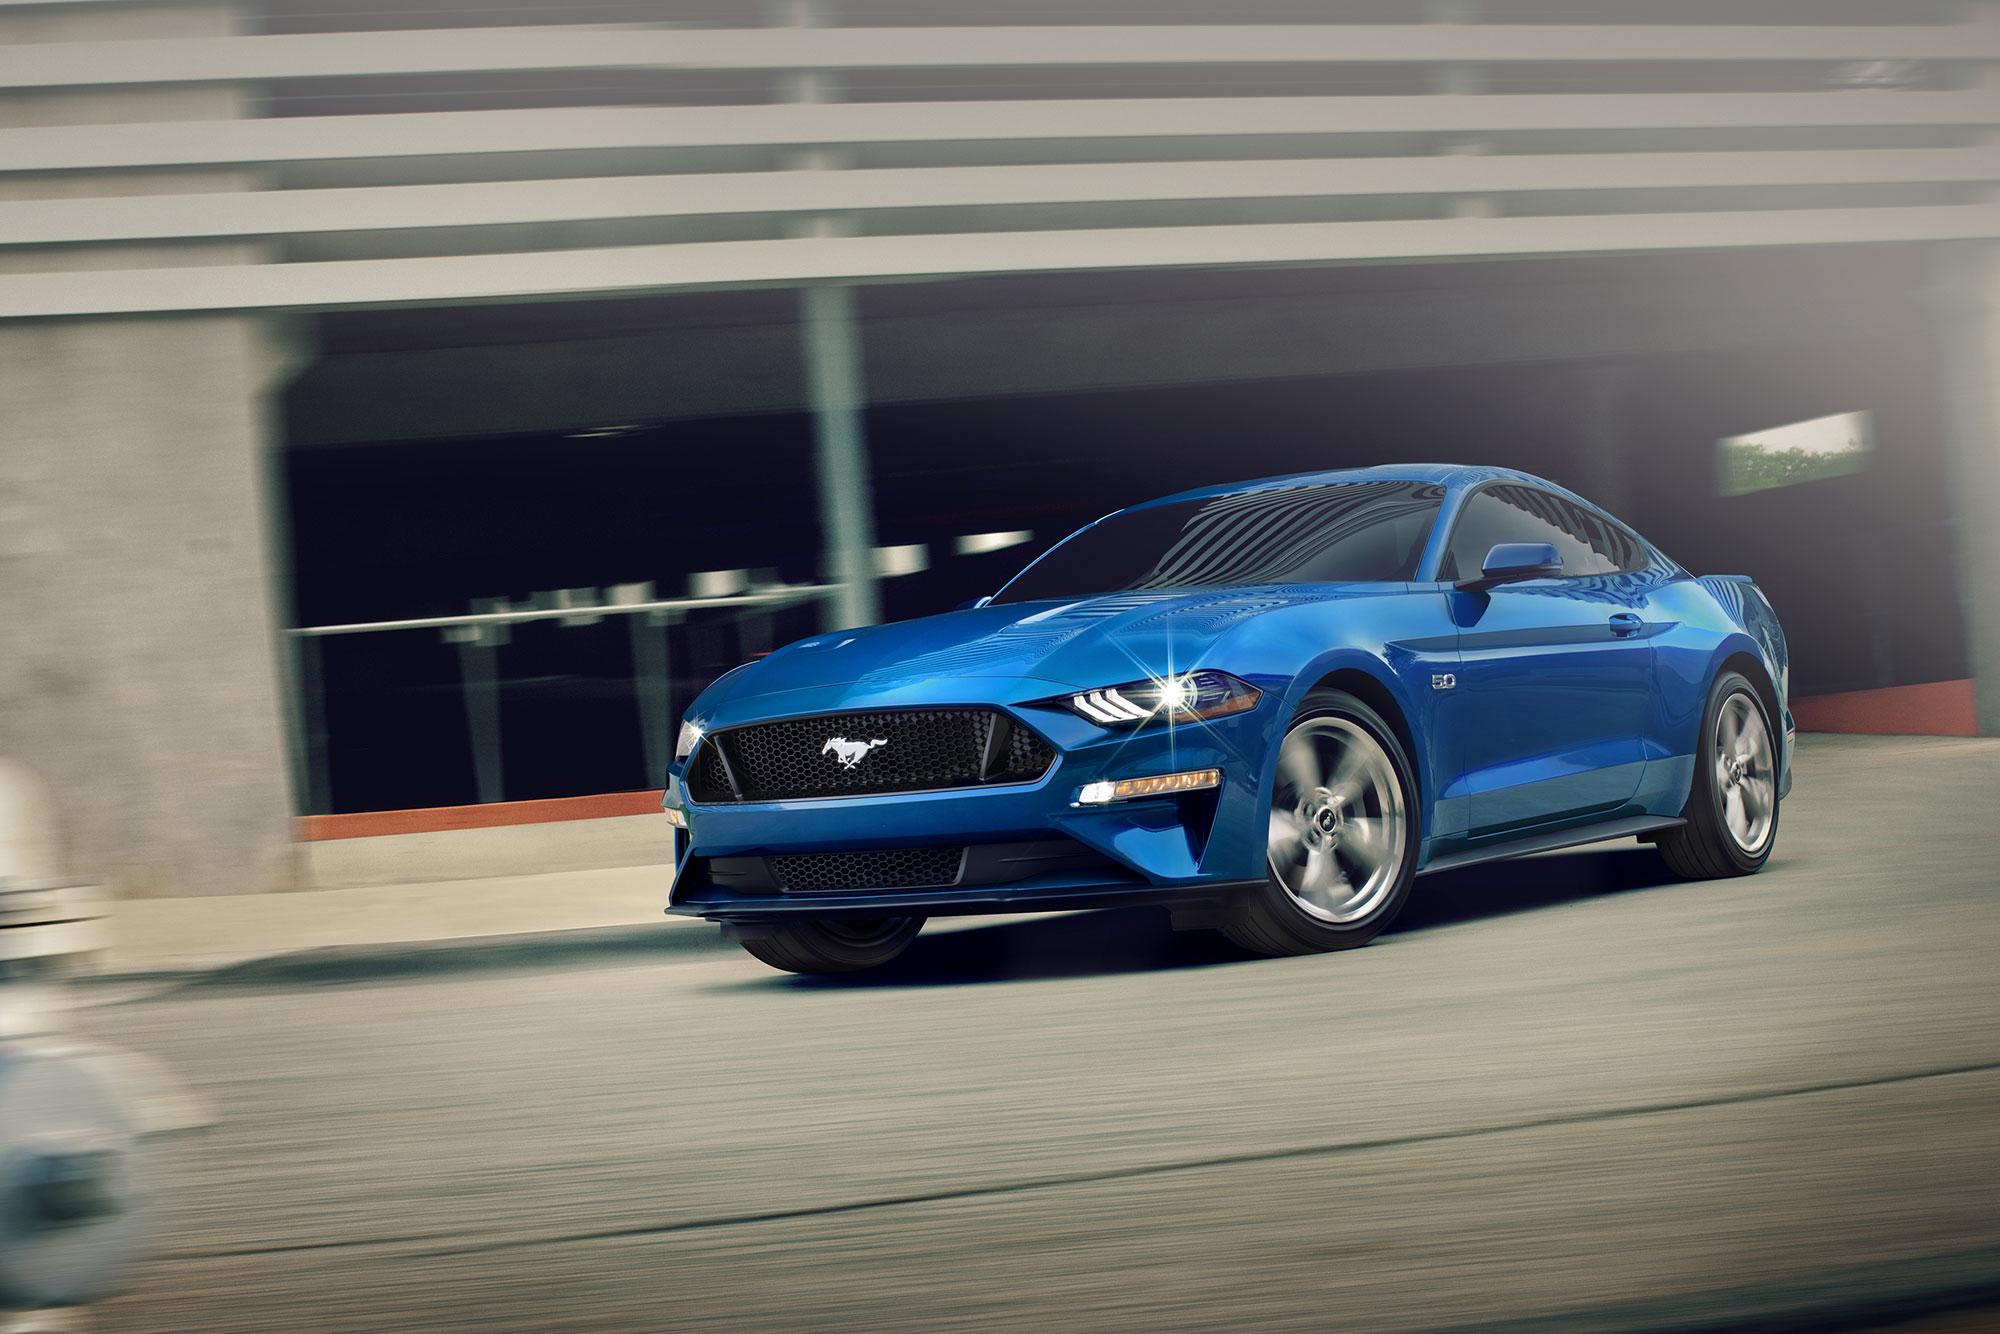 2021 Mustang Mach-e front